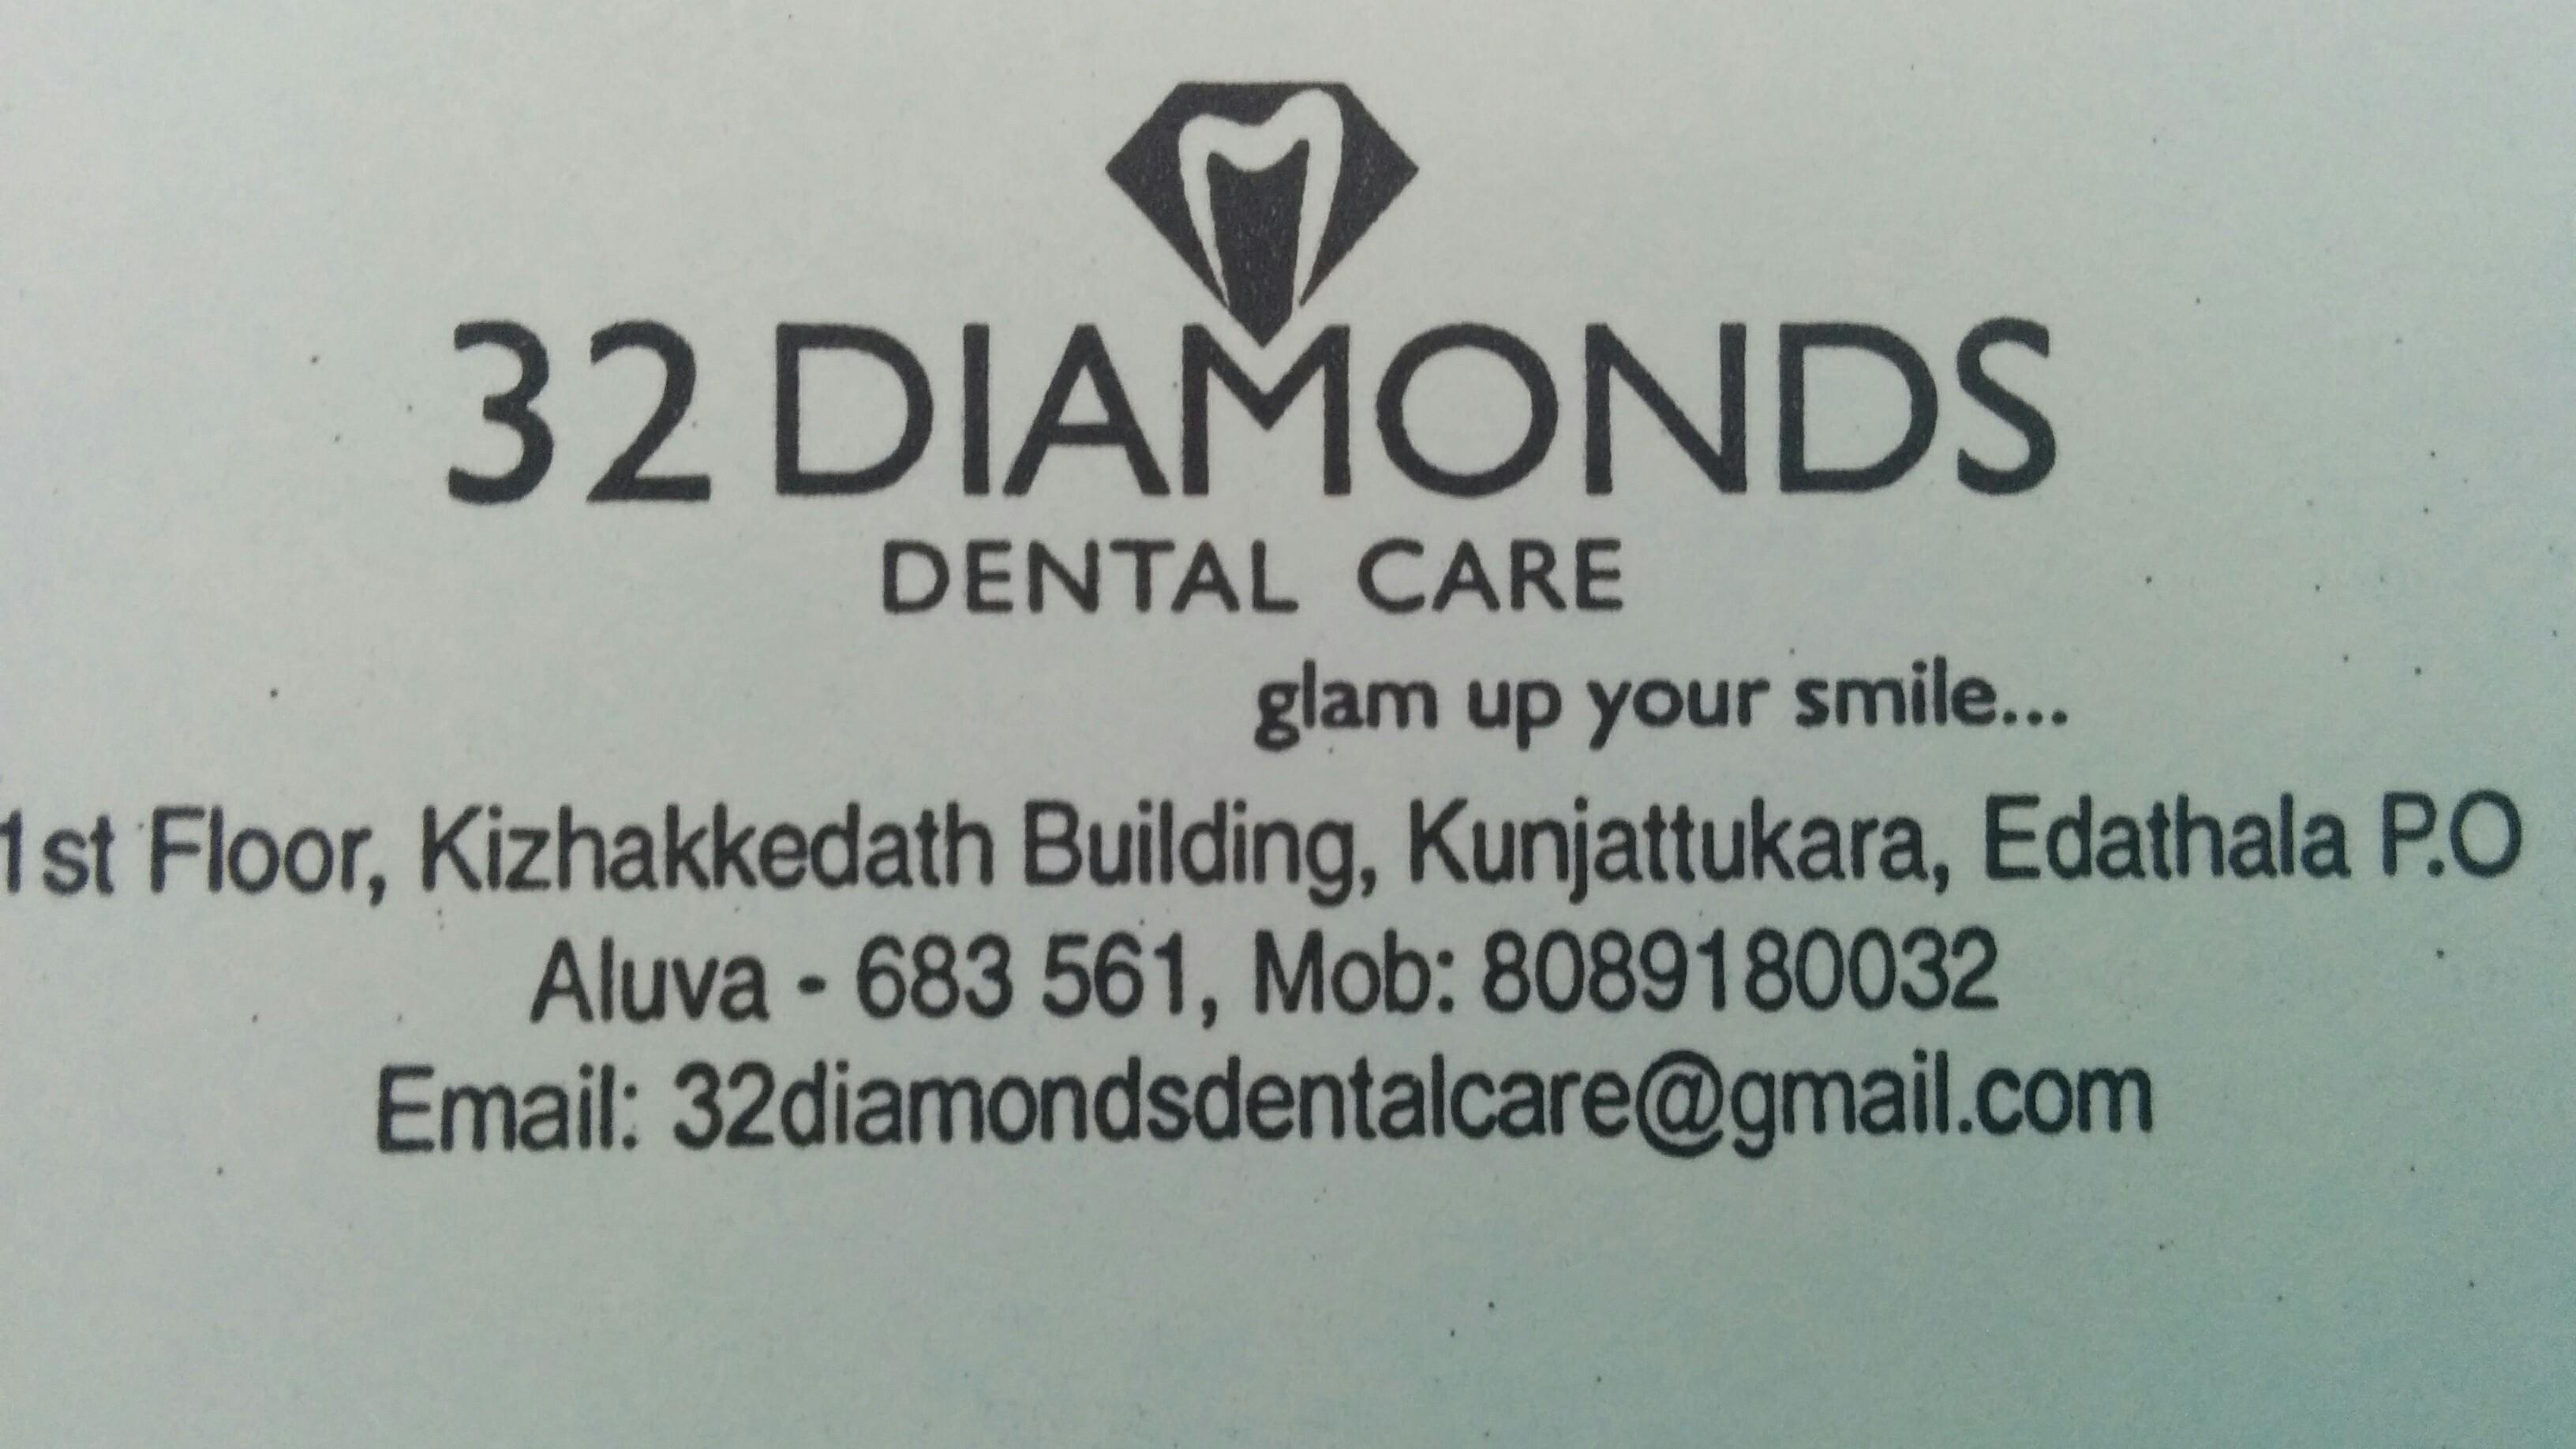 32 Diamonds Dental Care